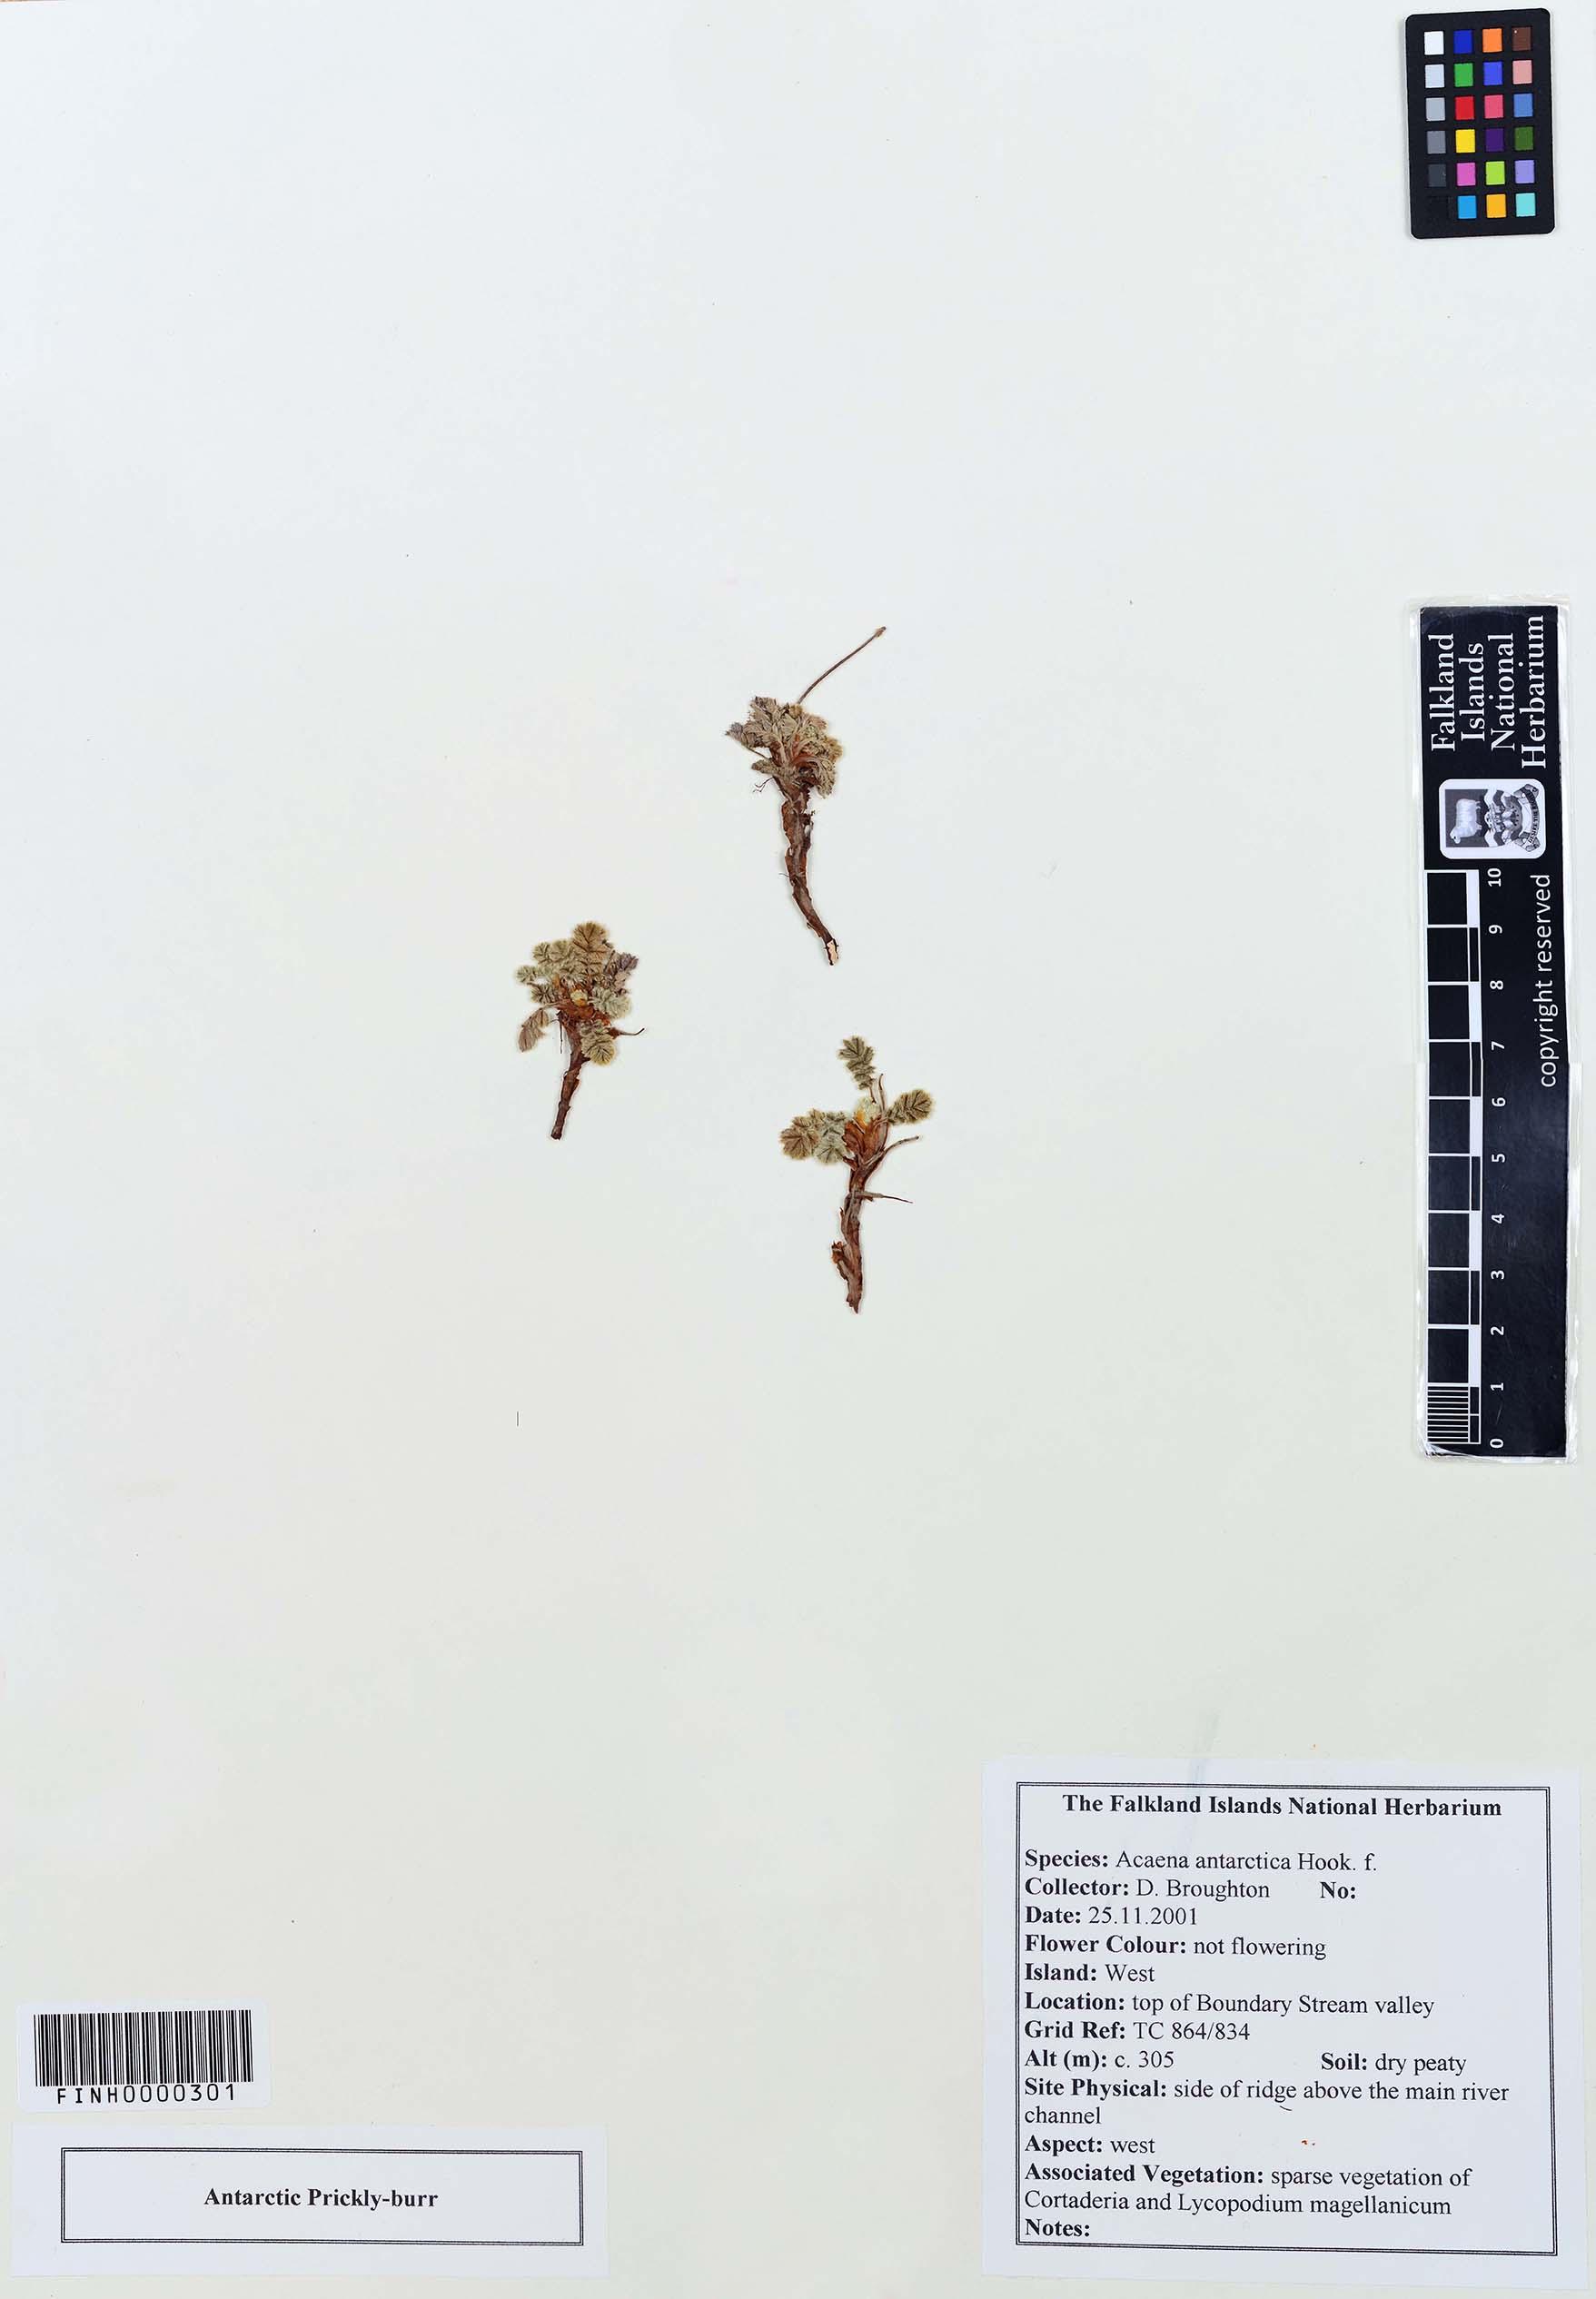 Acaena antarctica